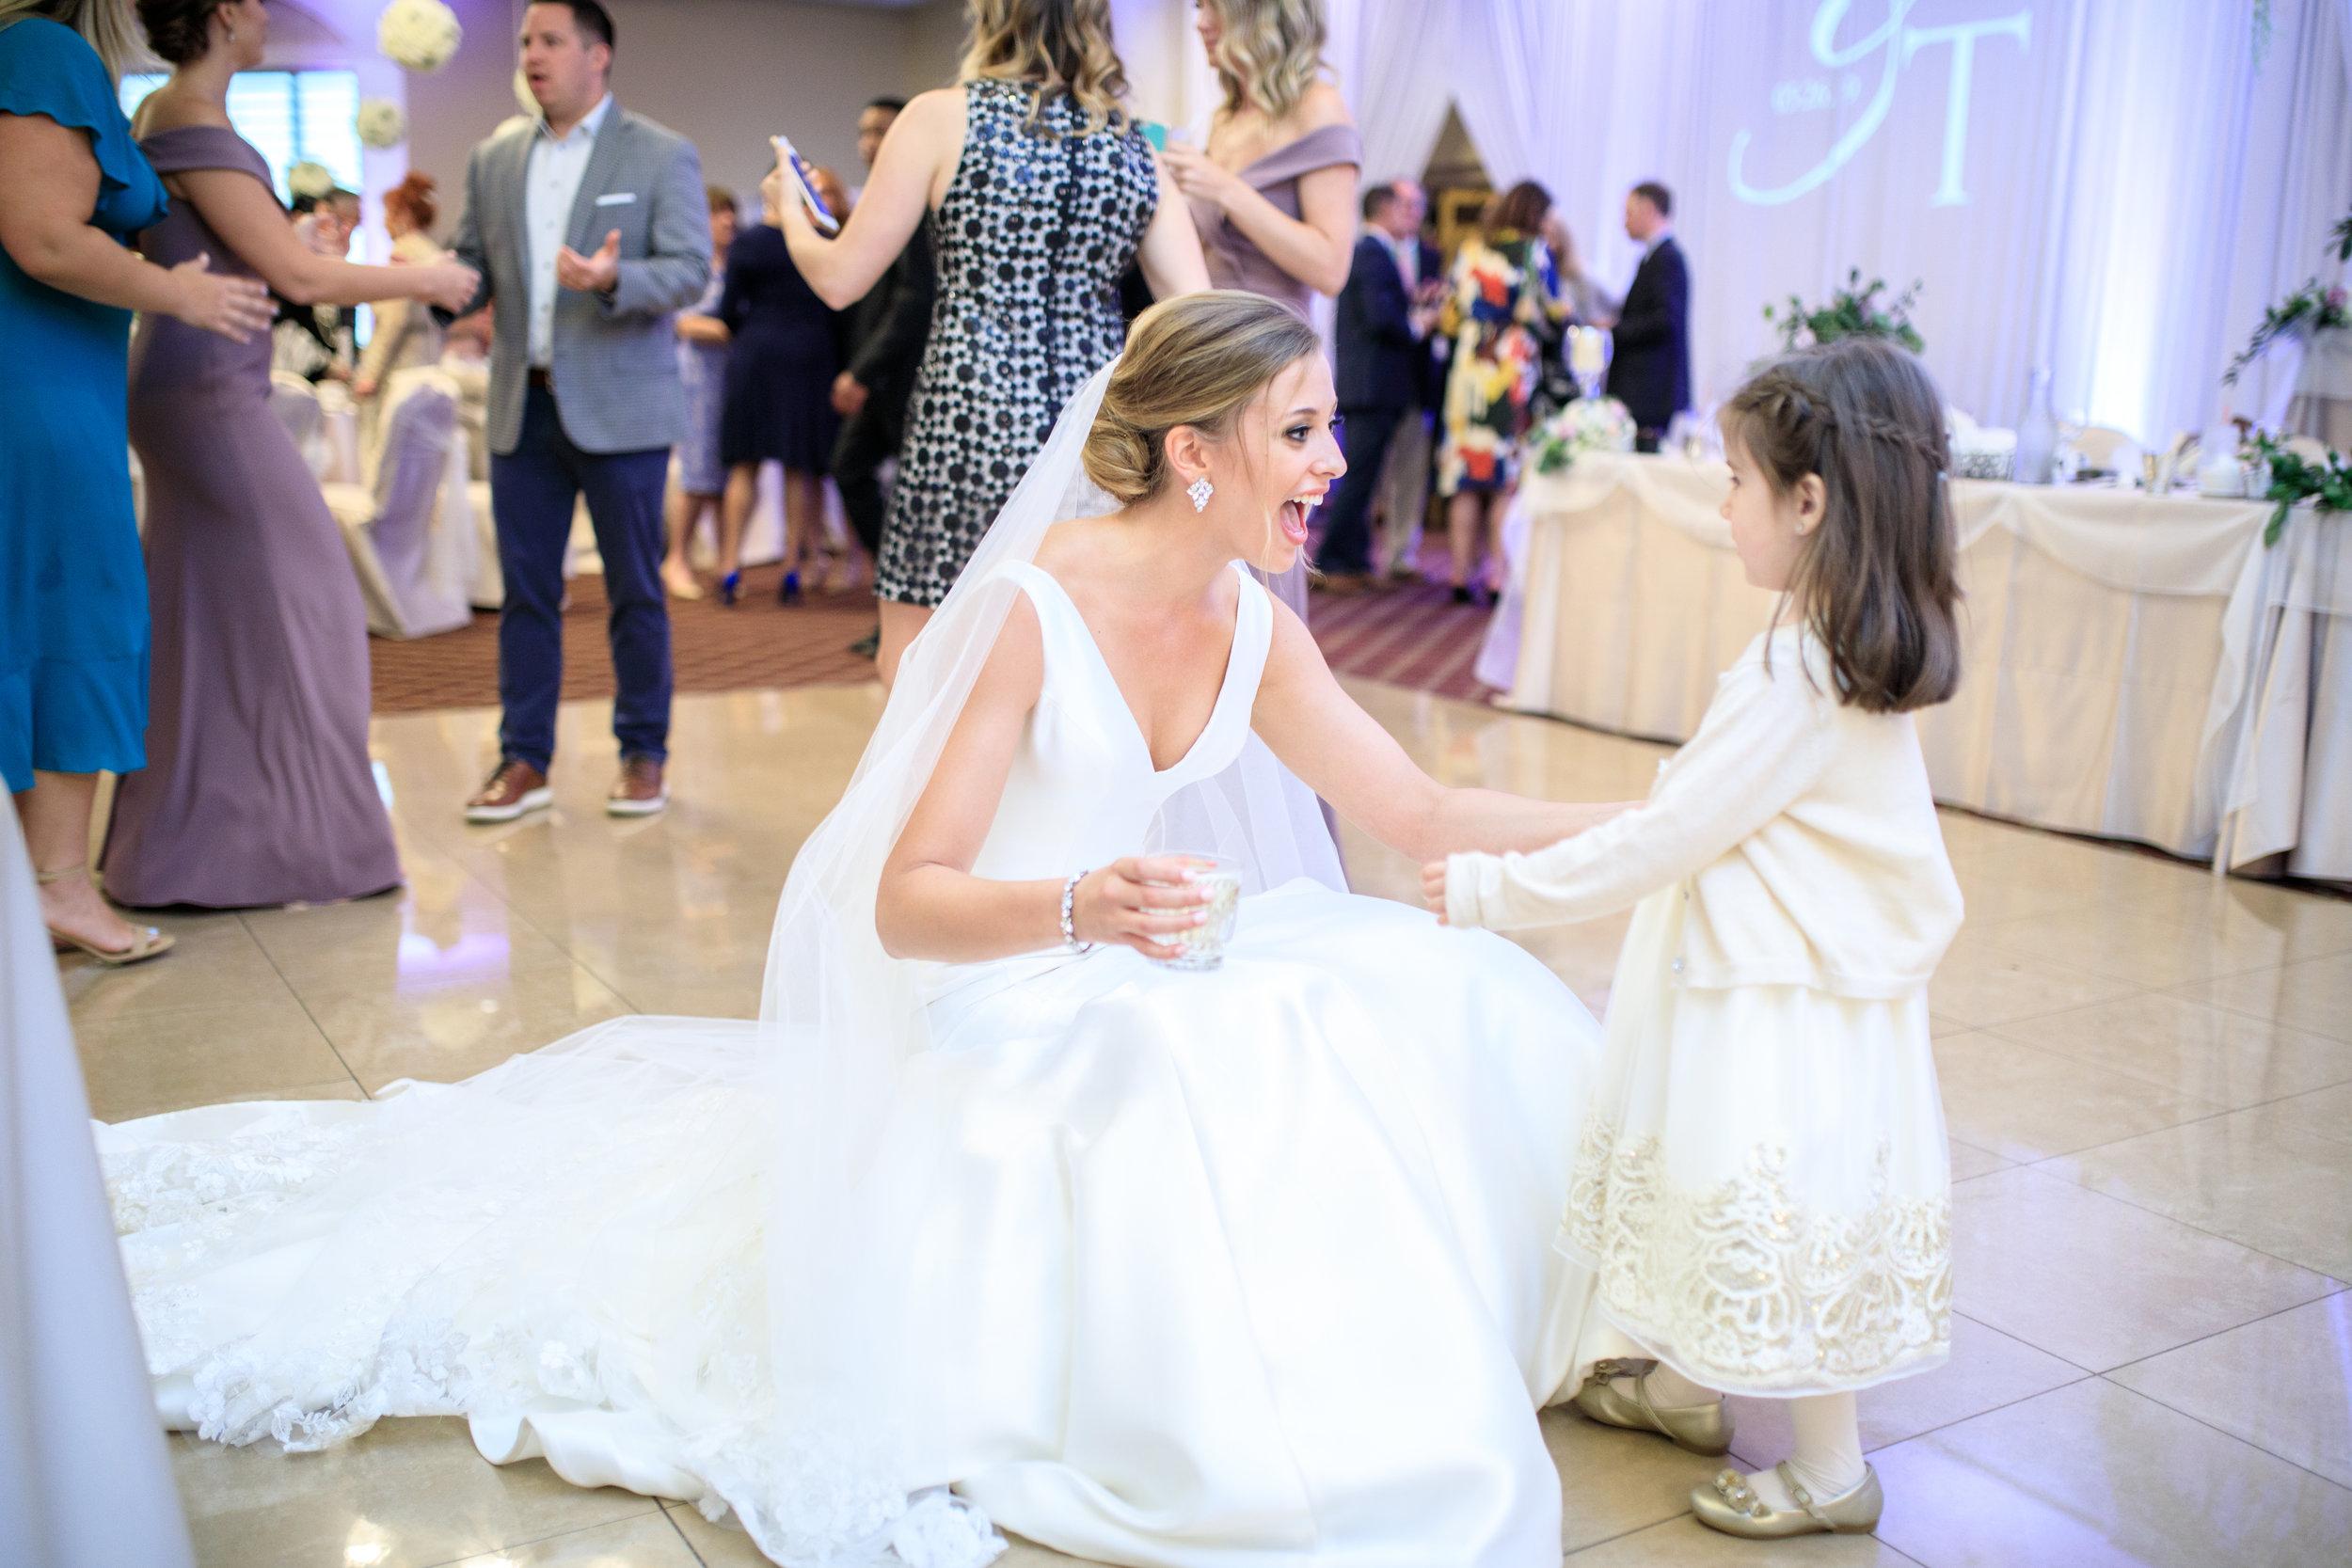 bride-with-flower-girl.jpg